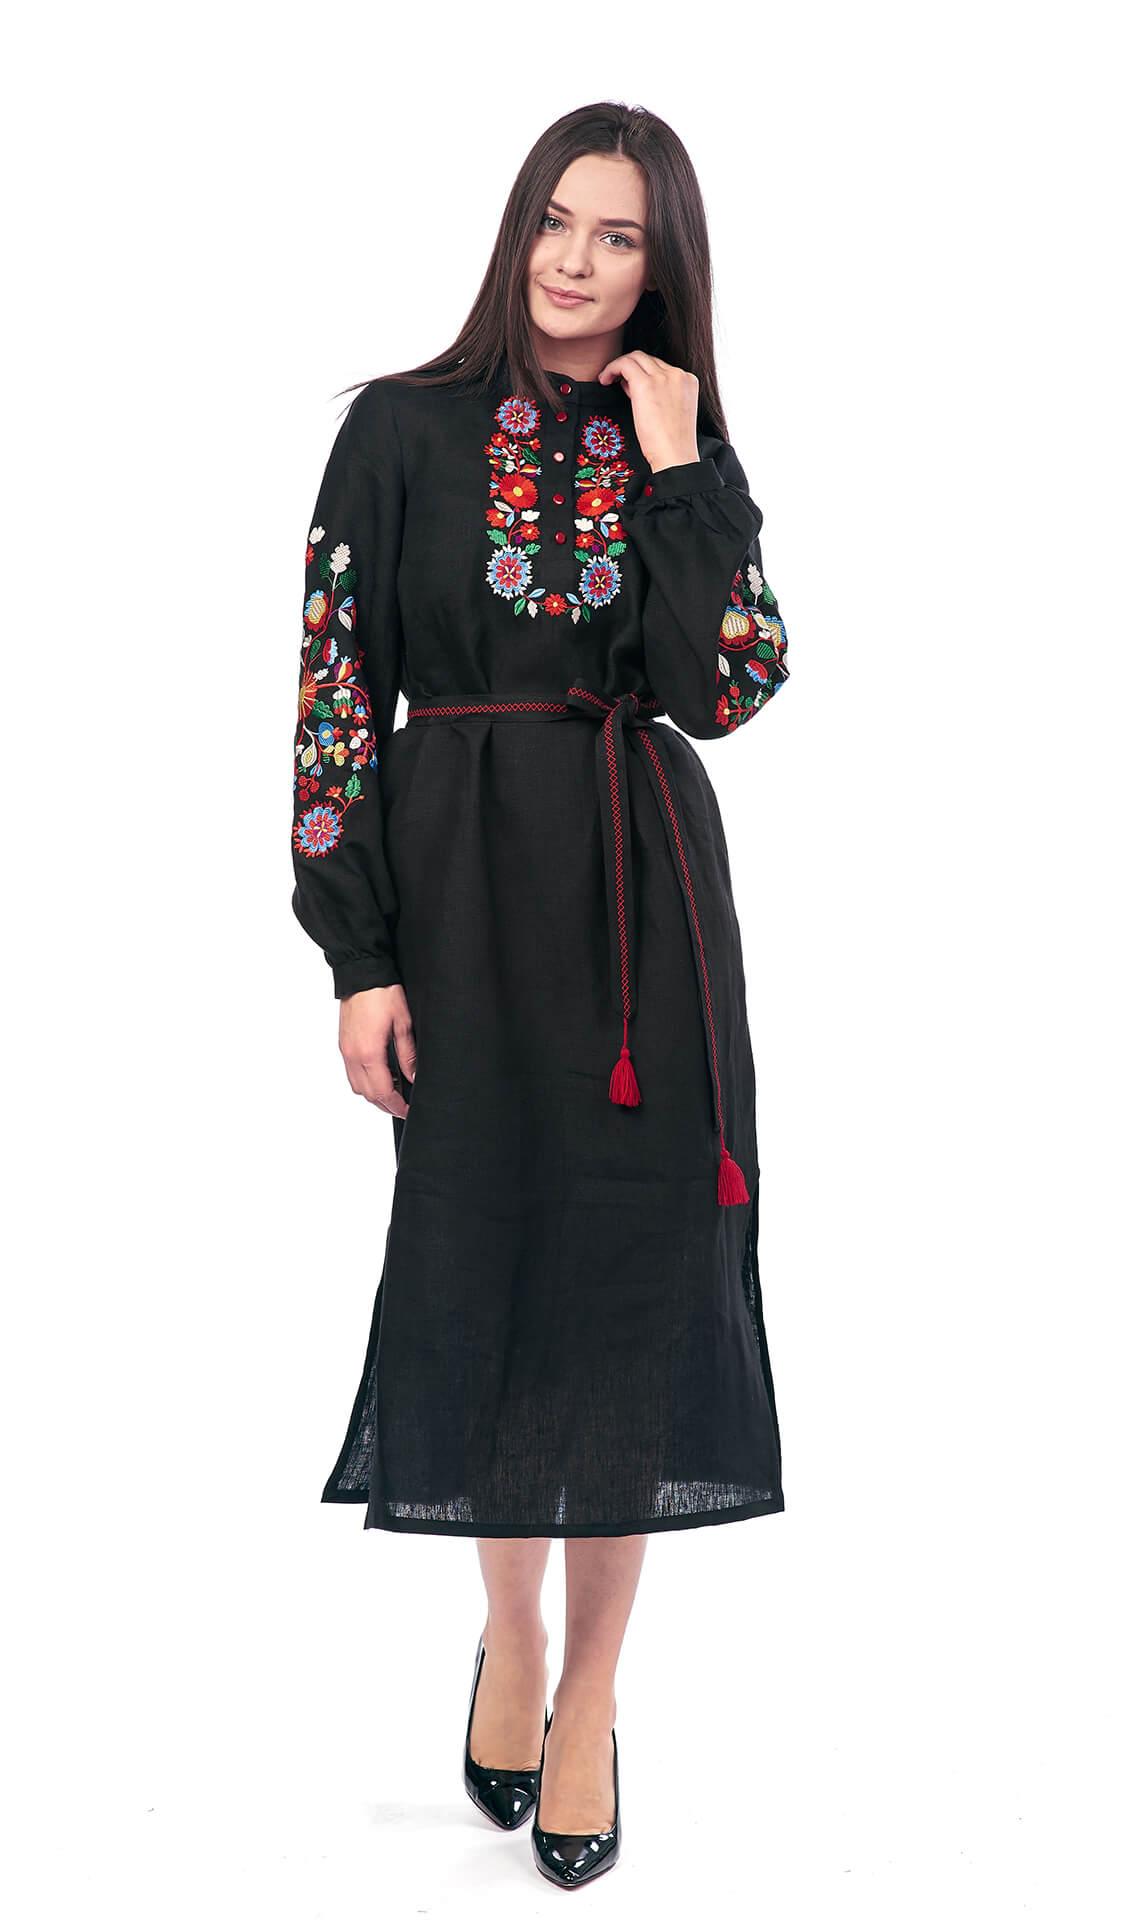 Edelvika Women's Embroidered Floral Dress, Black, Long Sleeves, 100% Linen image